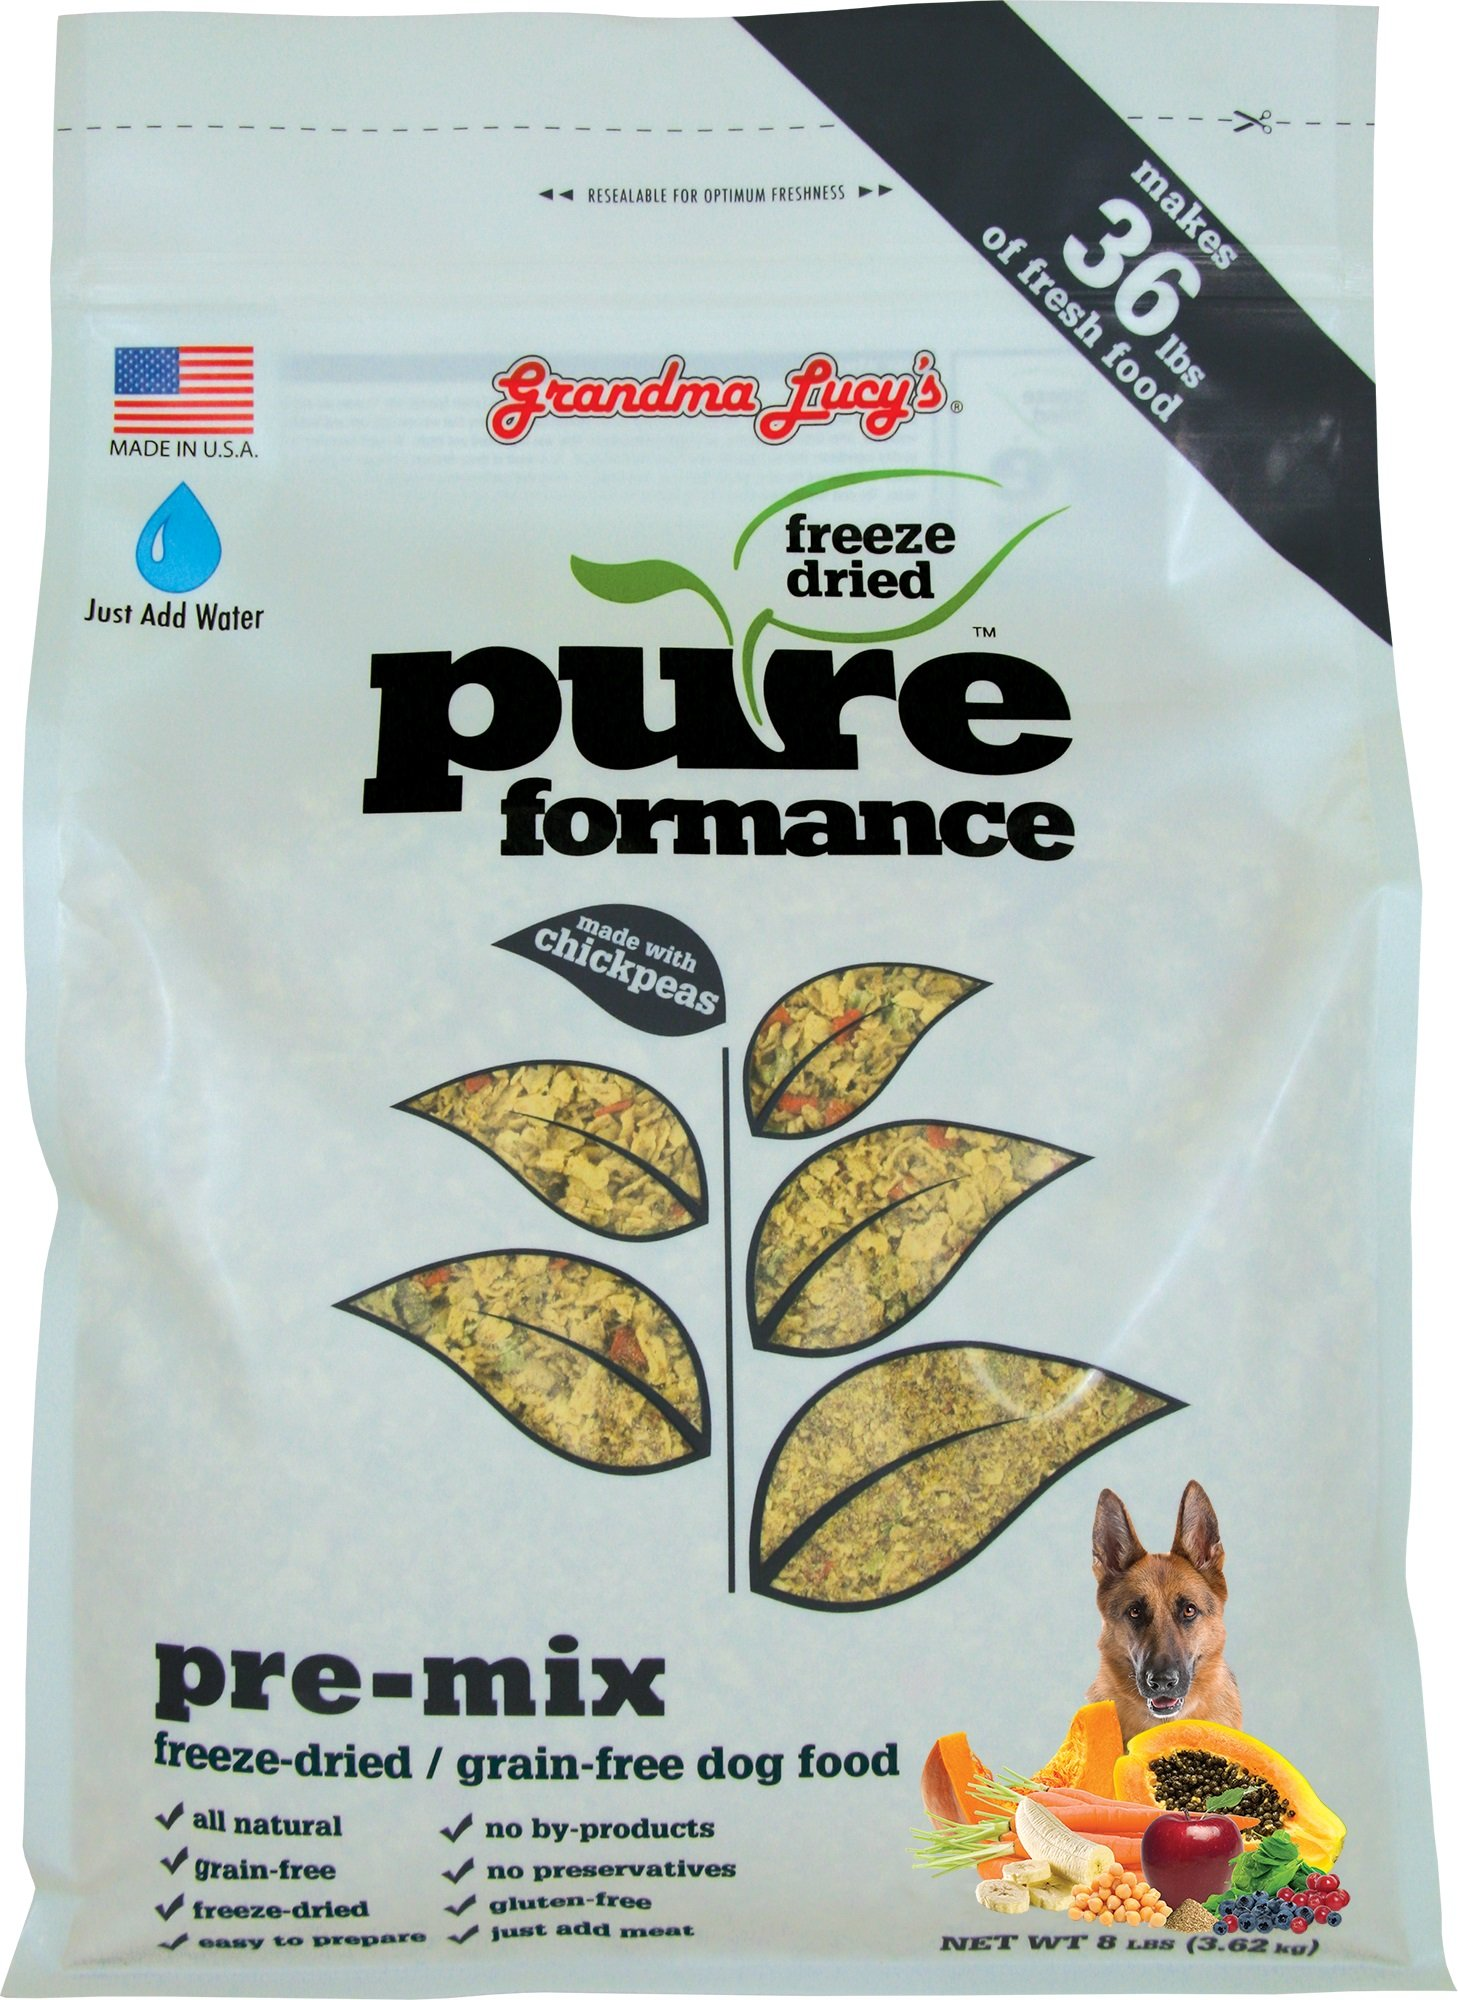 Grandma Lucy's Freeze-Dried Grain-Free Pet Food: Pureformance Pre-Mix 8lbs